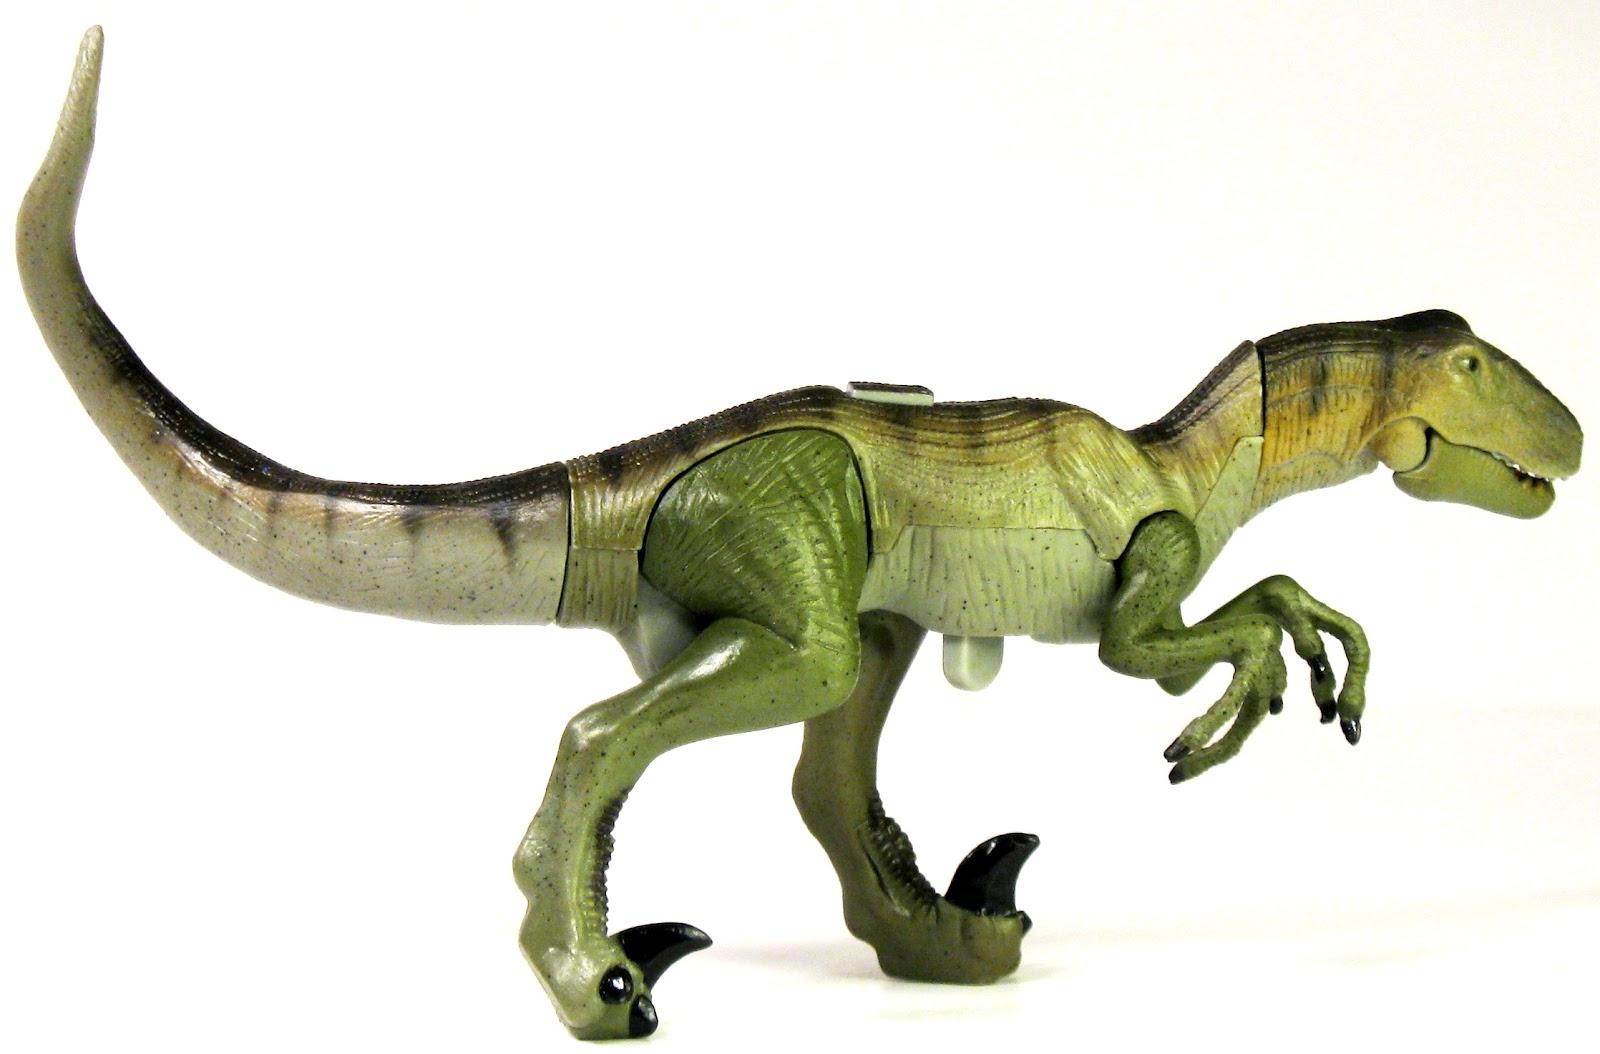 Toys and Stuff: Playmates #66003 Kong vs Venatosaurus